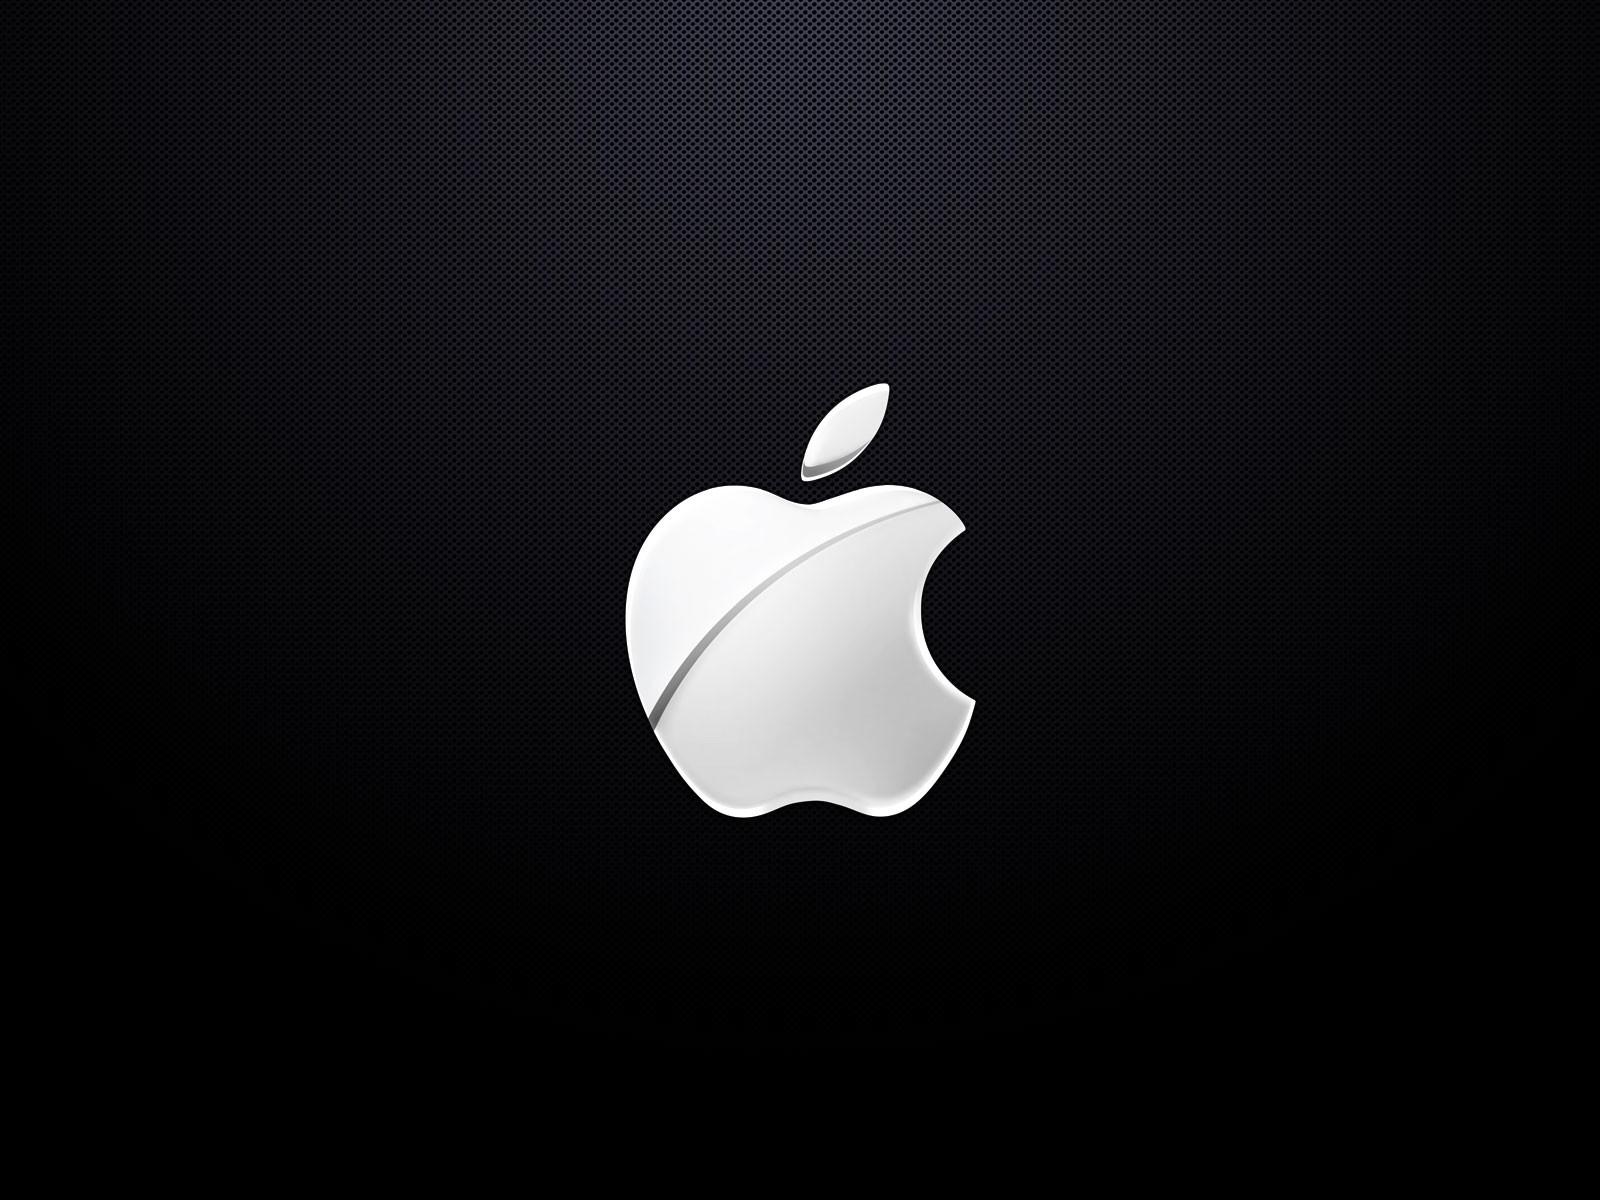 Apple думает о закупке киностудии